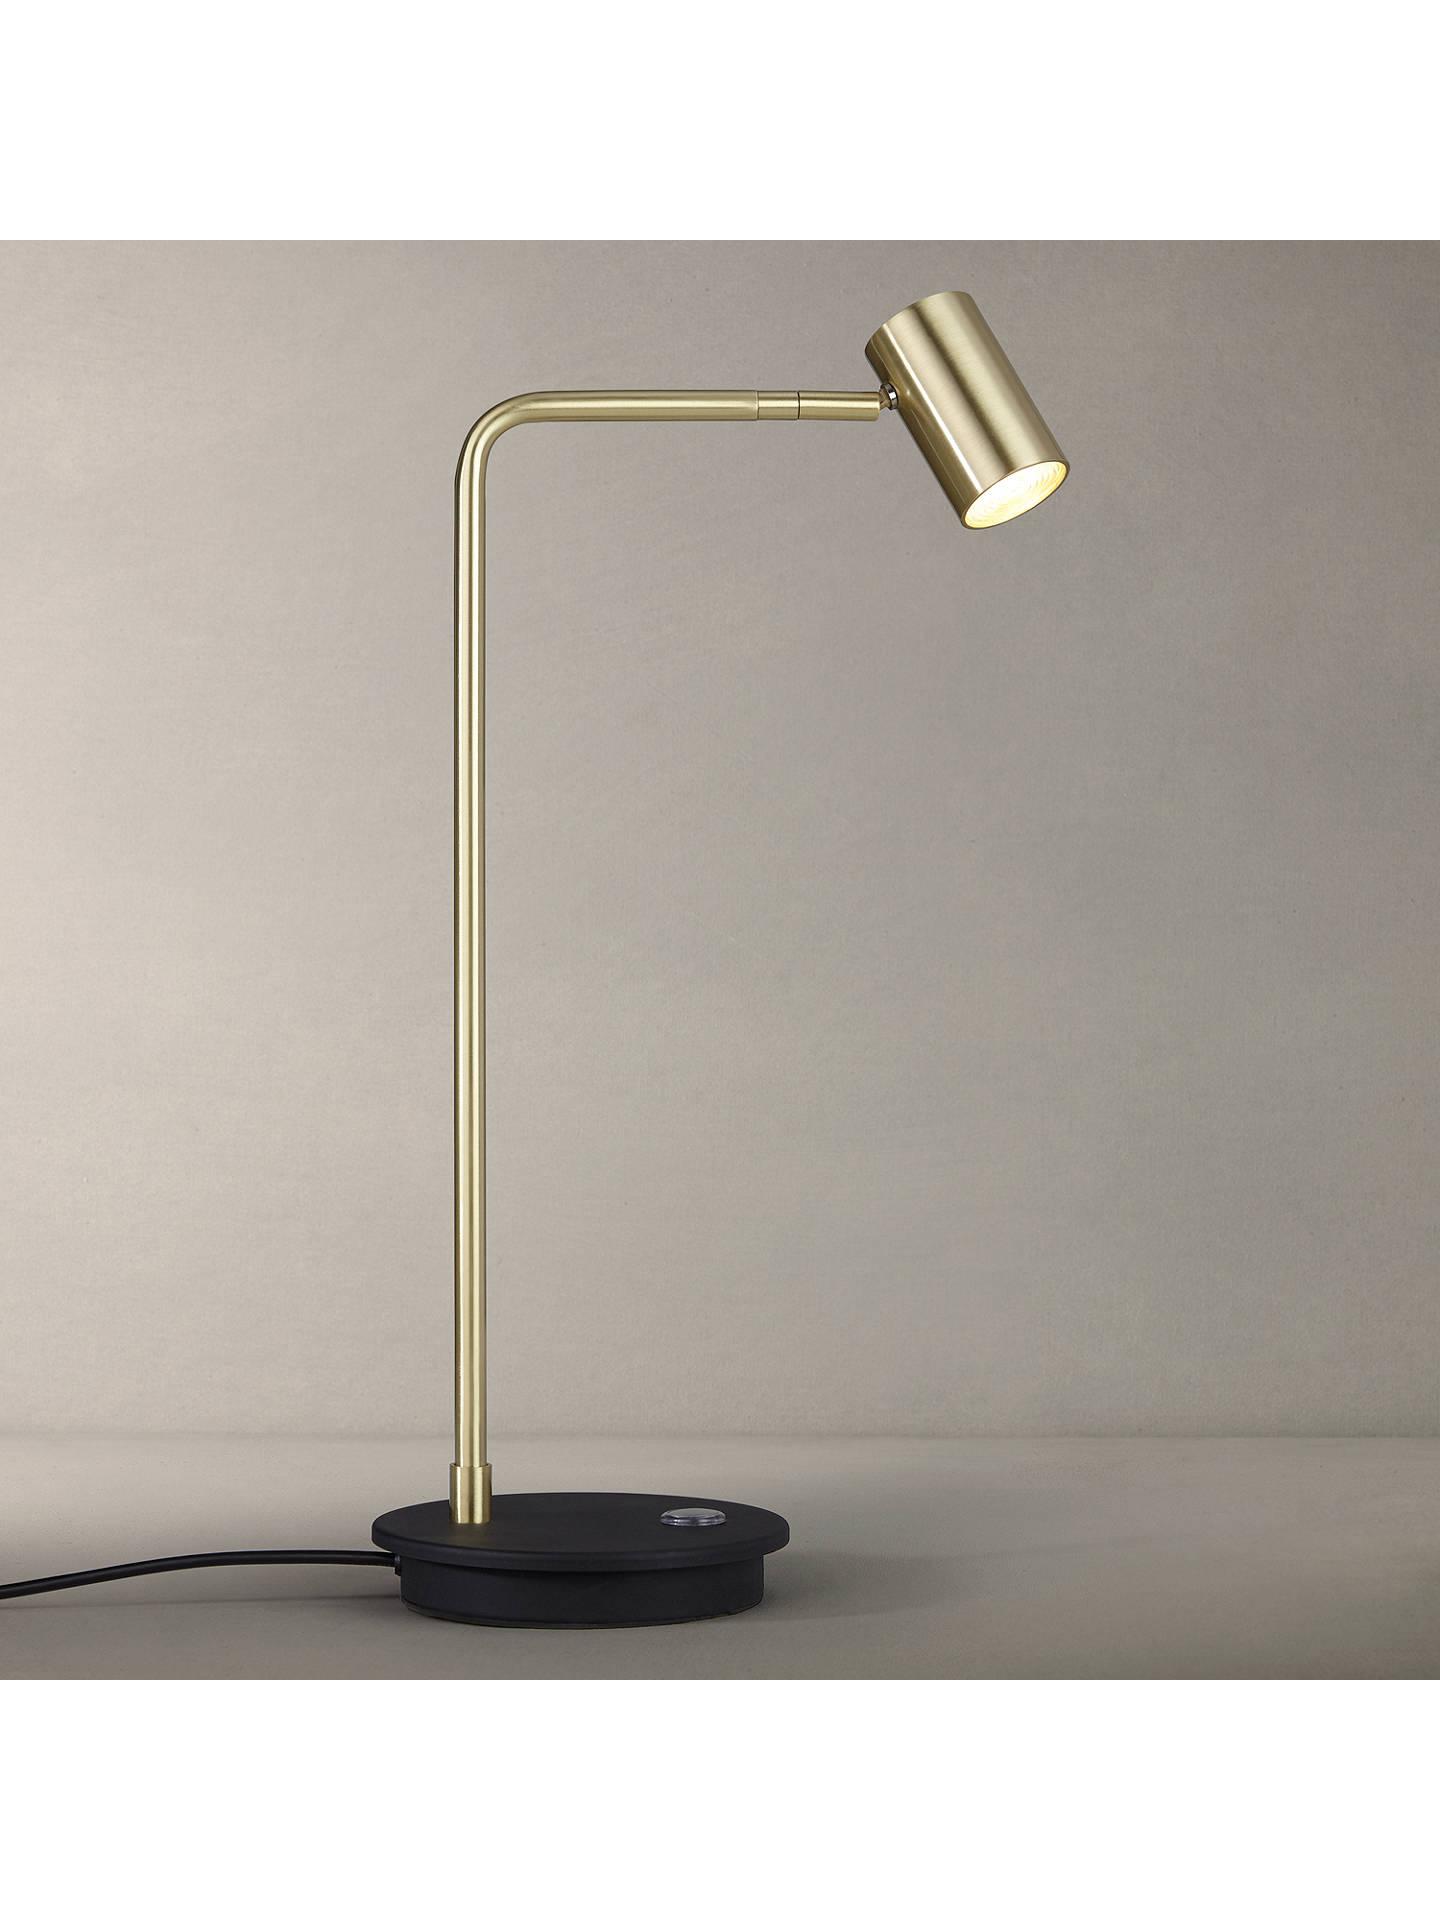 John Lewis Partners Alpha Led Desk Lamp Gold Black